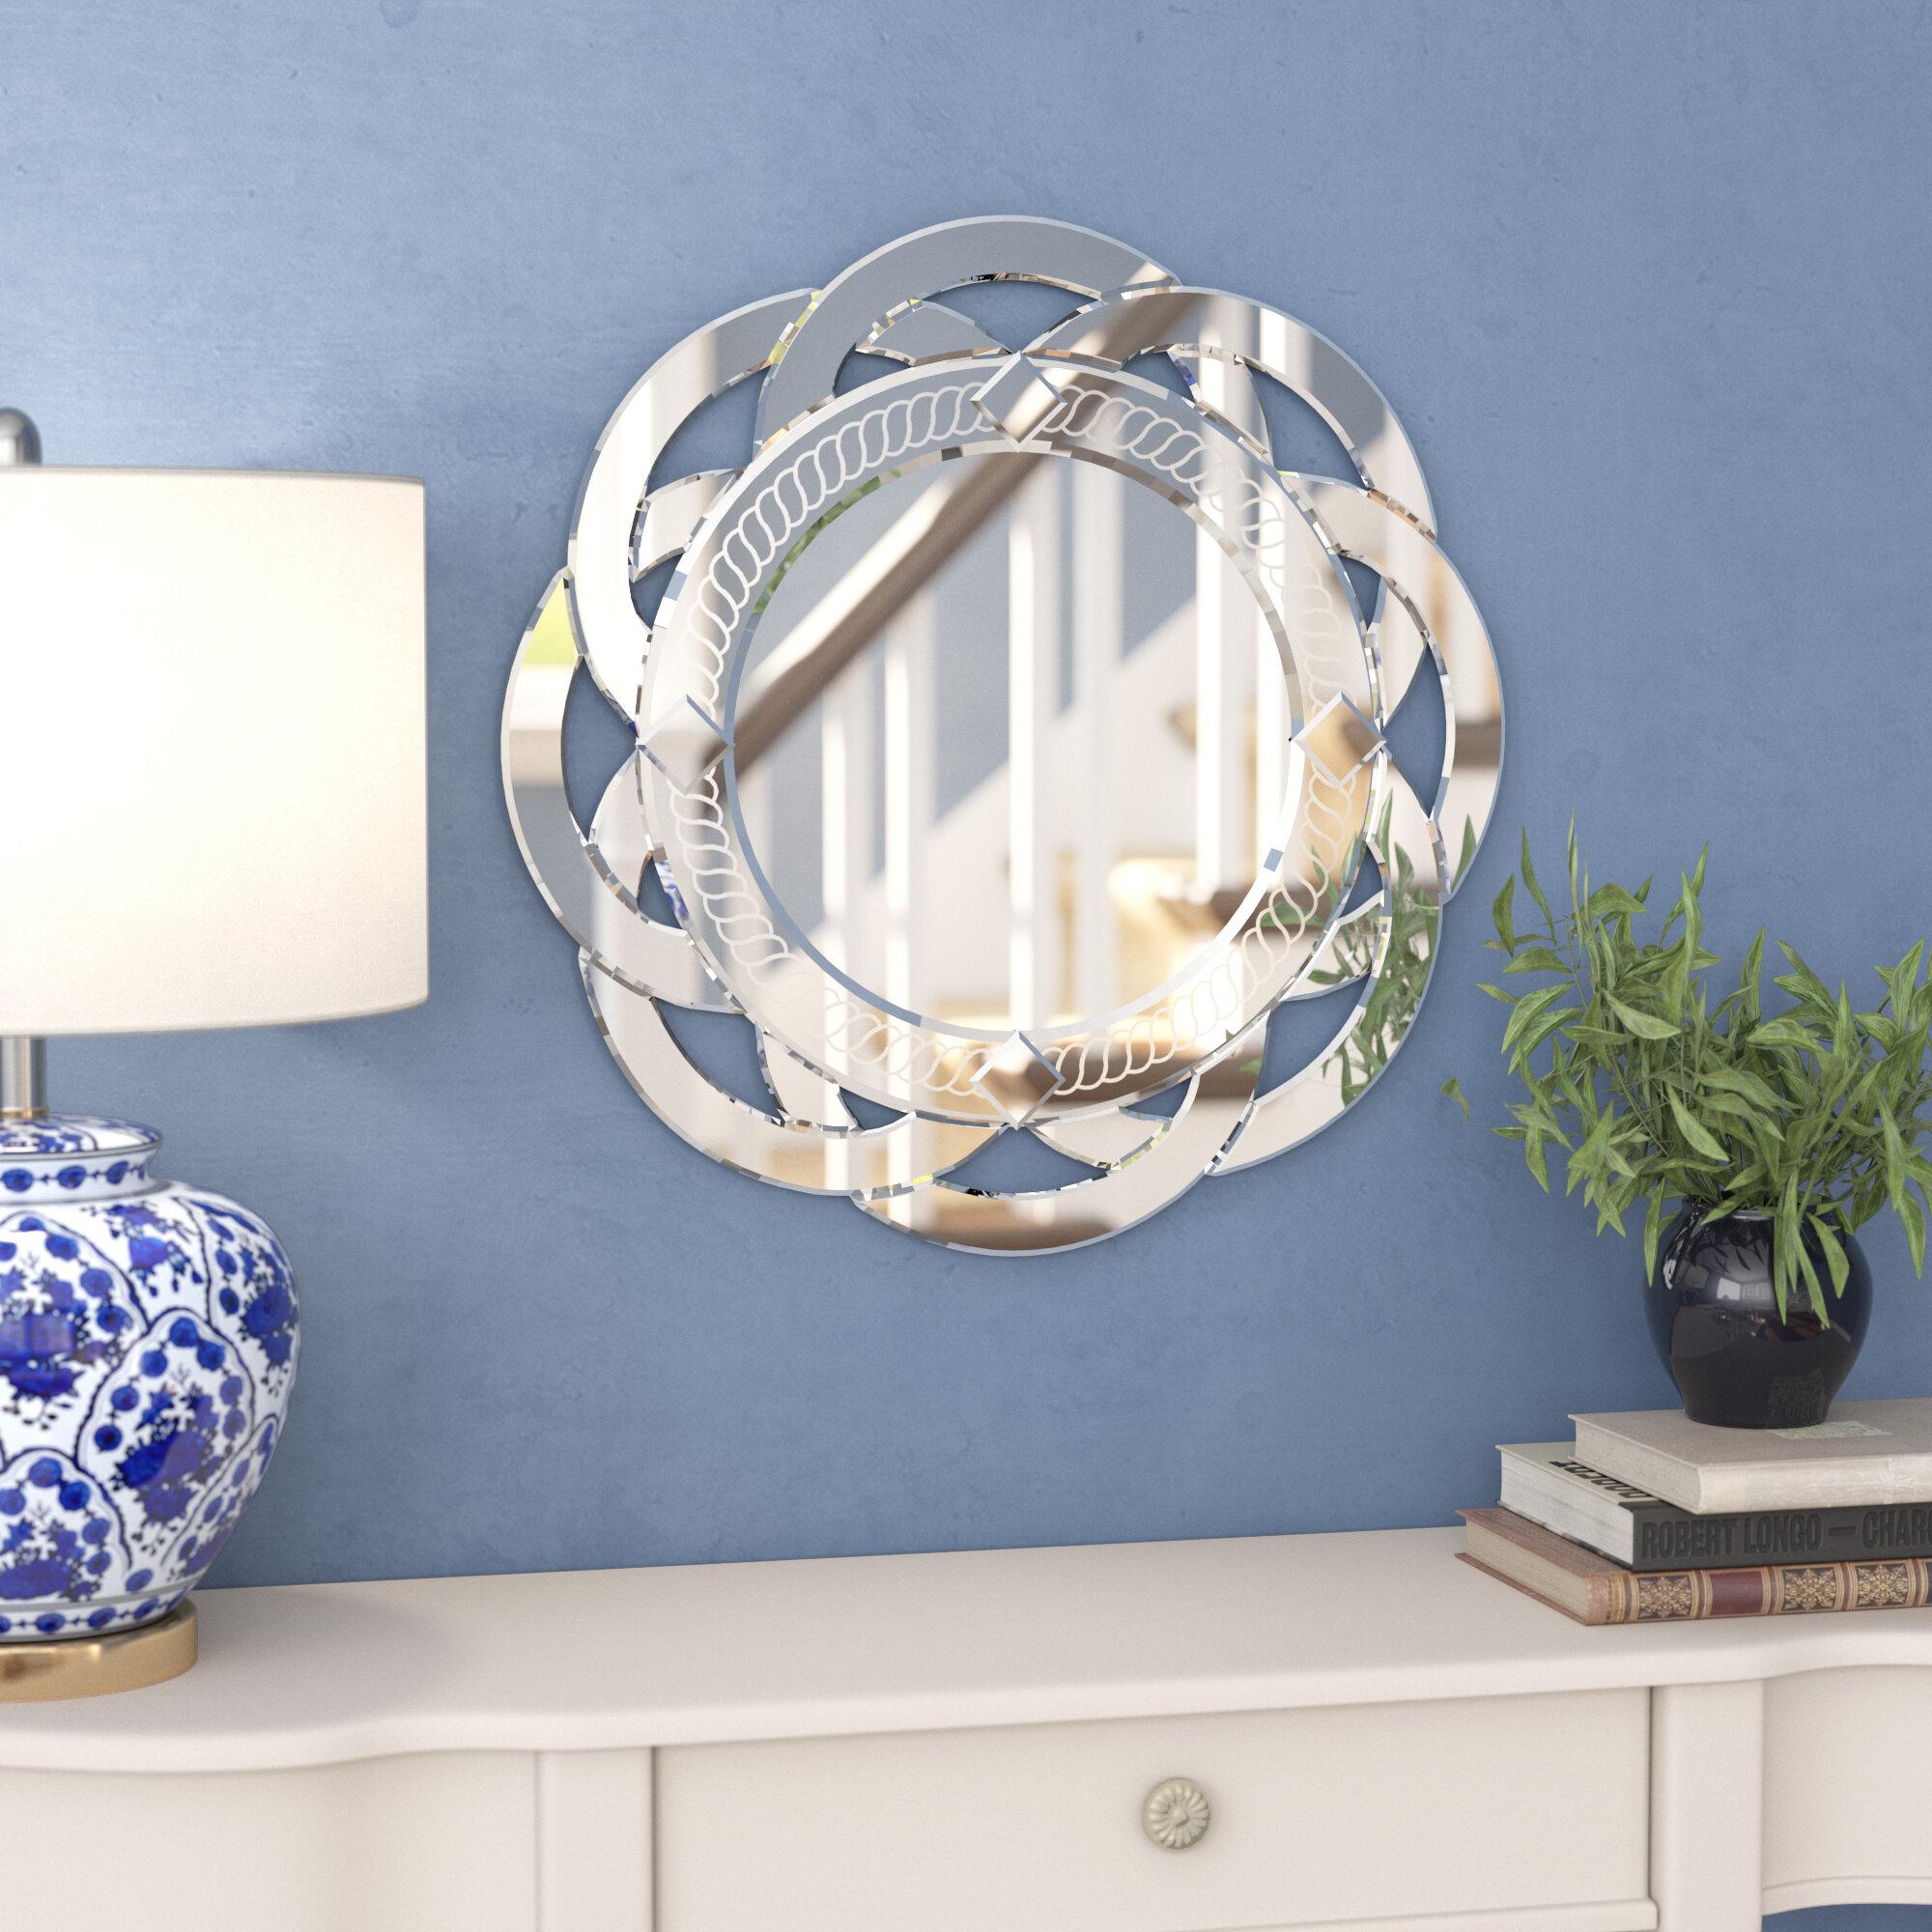 House Of Hampton Griswalde Flower Glass Wall Mirror Reviews Wayfair